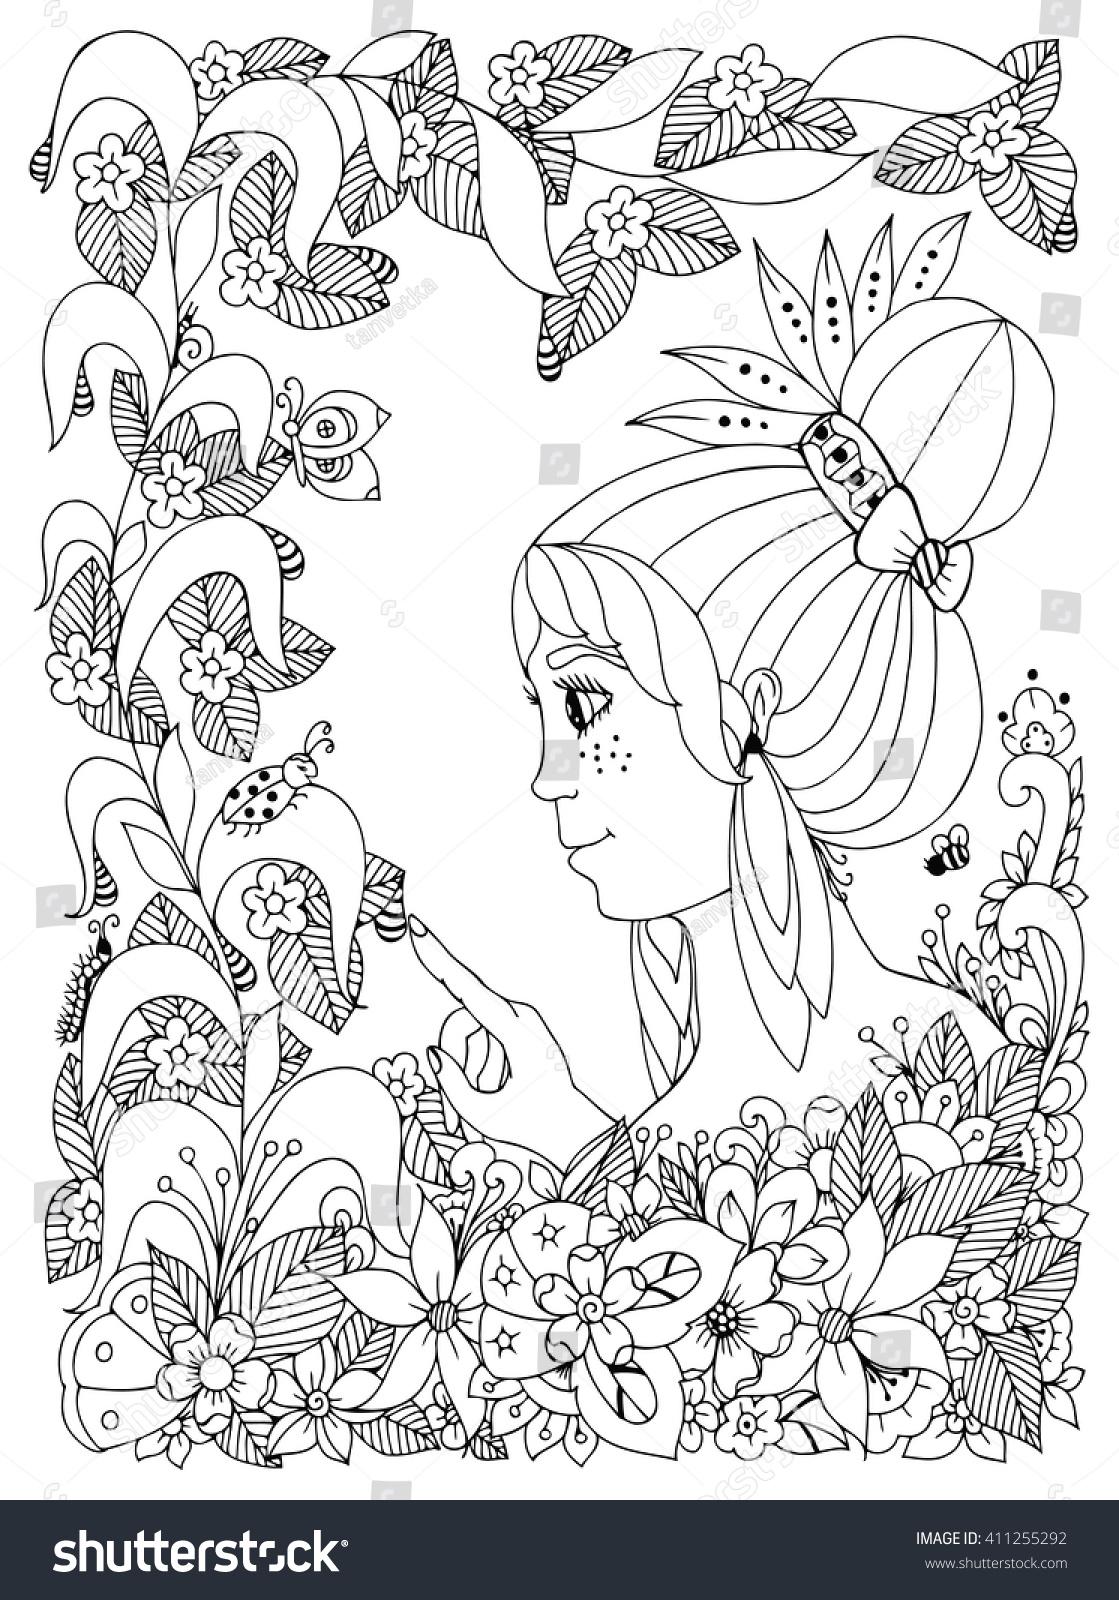 Zen coloring books for children - Vector Illustration Zen Tangl Girl Child With Freckles Looks At Ladybug In A Flower Doodle